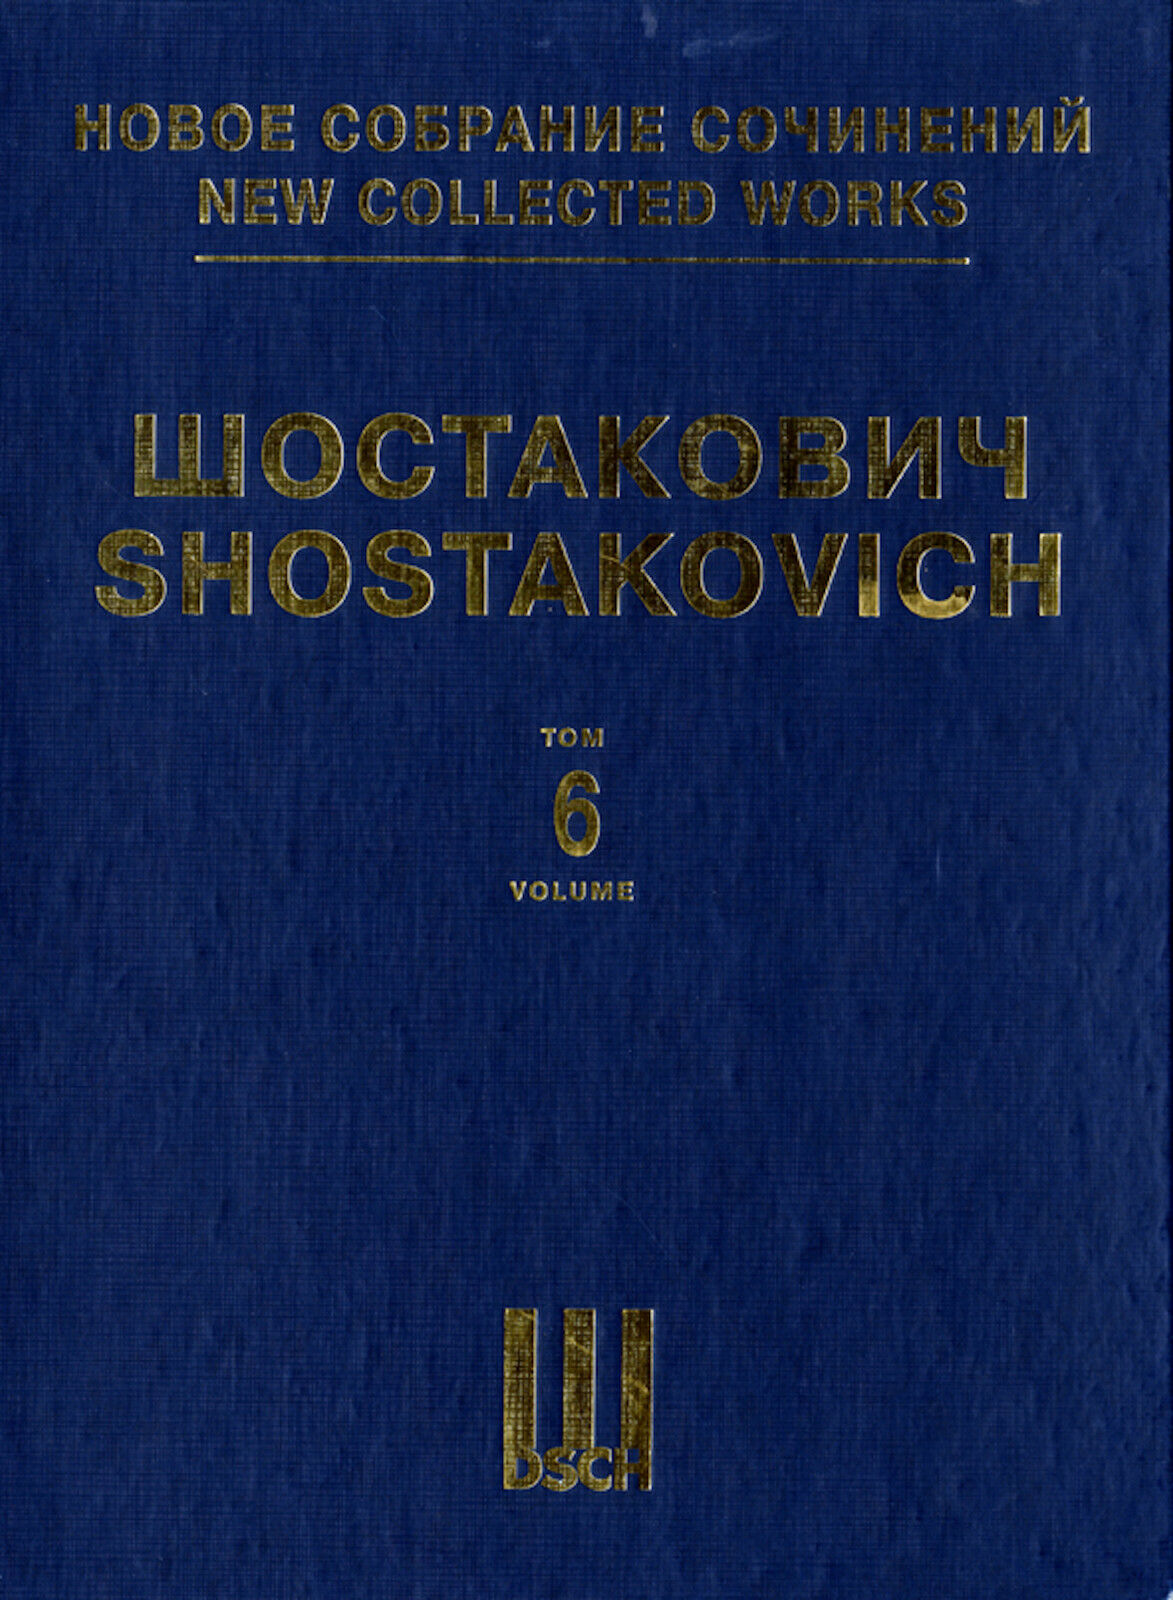 Dmitri Shostakovich - Symphony No. 6. Op. 54 Score - Sheet music